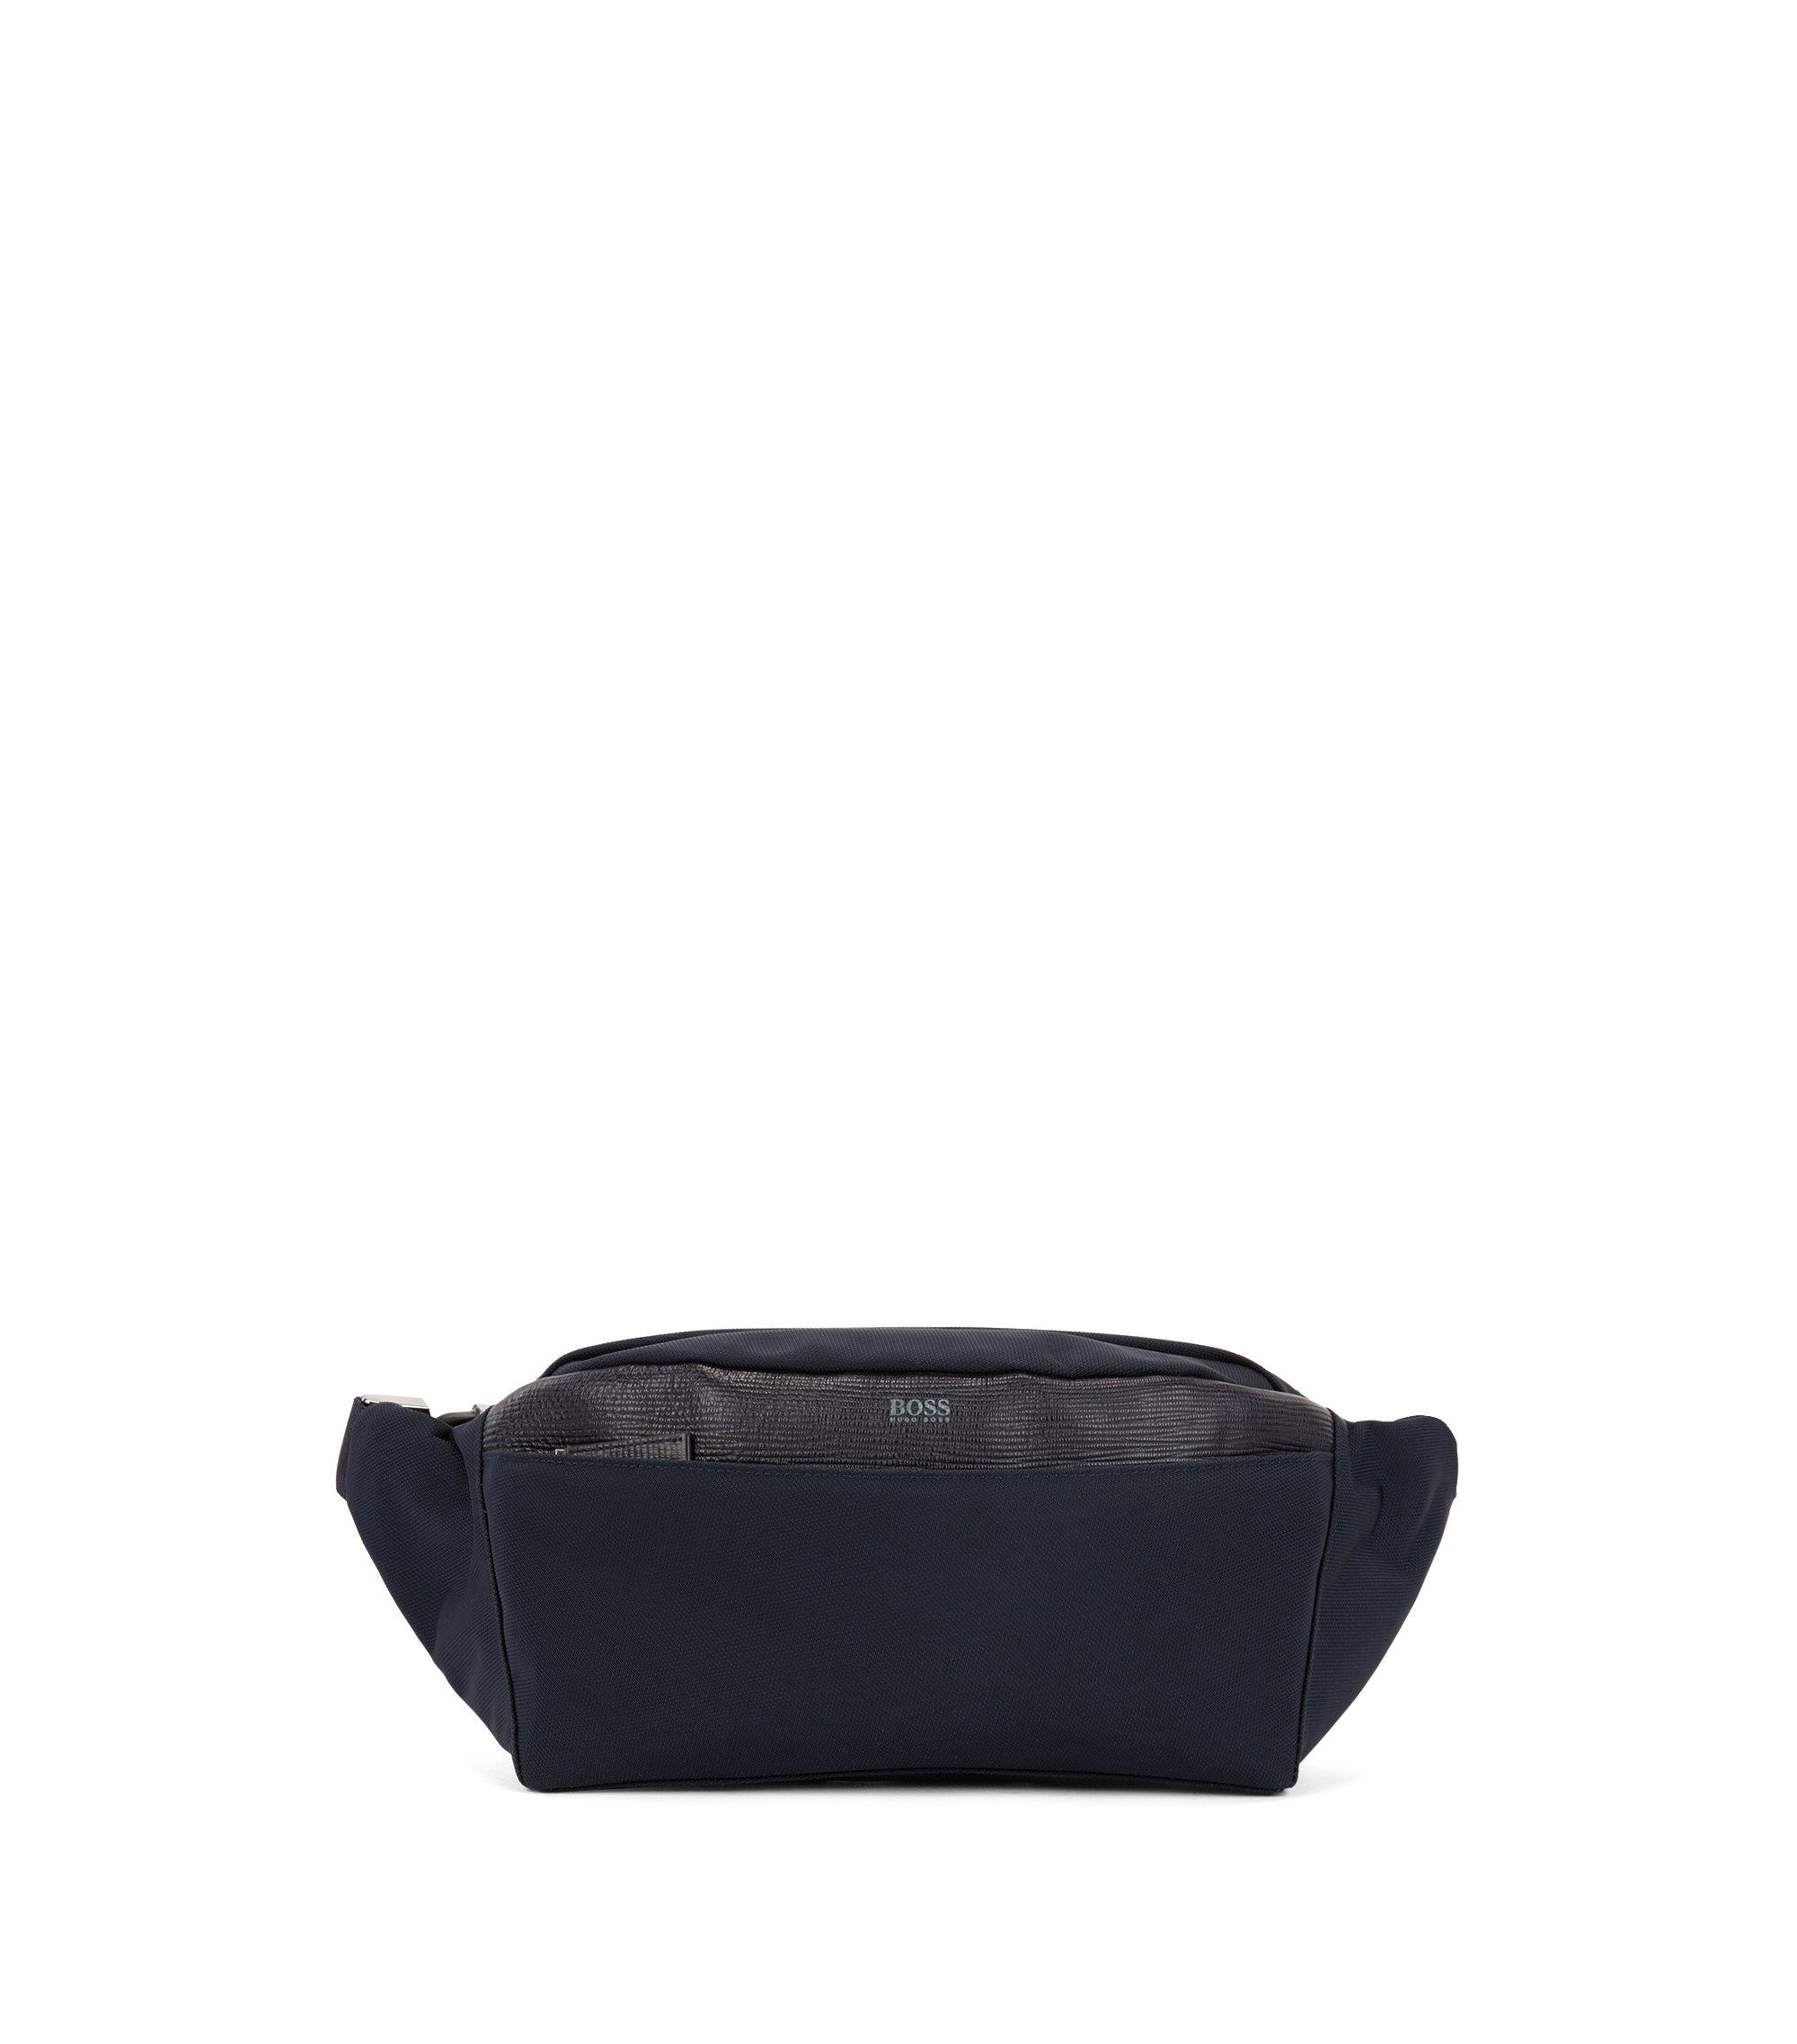 Nylon belt bag with calf-leather trim, Dark Blue